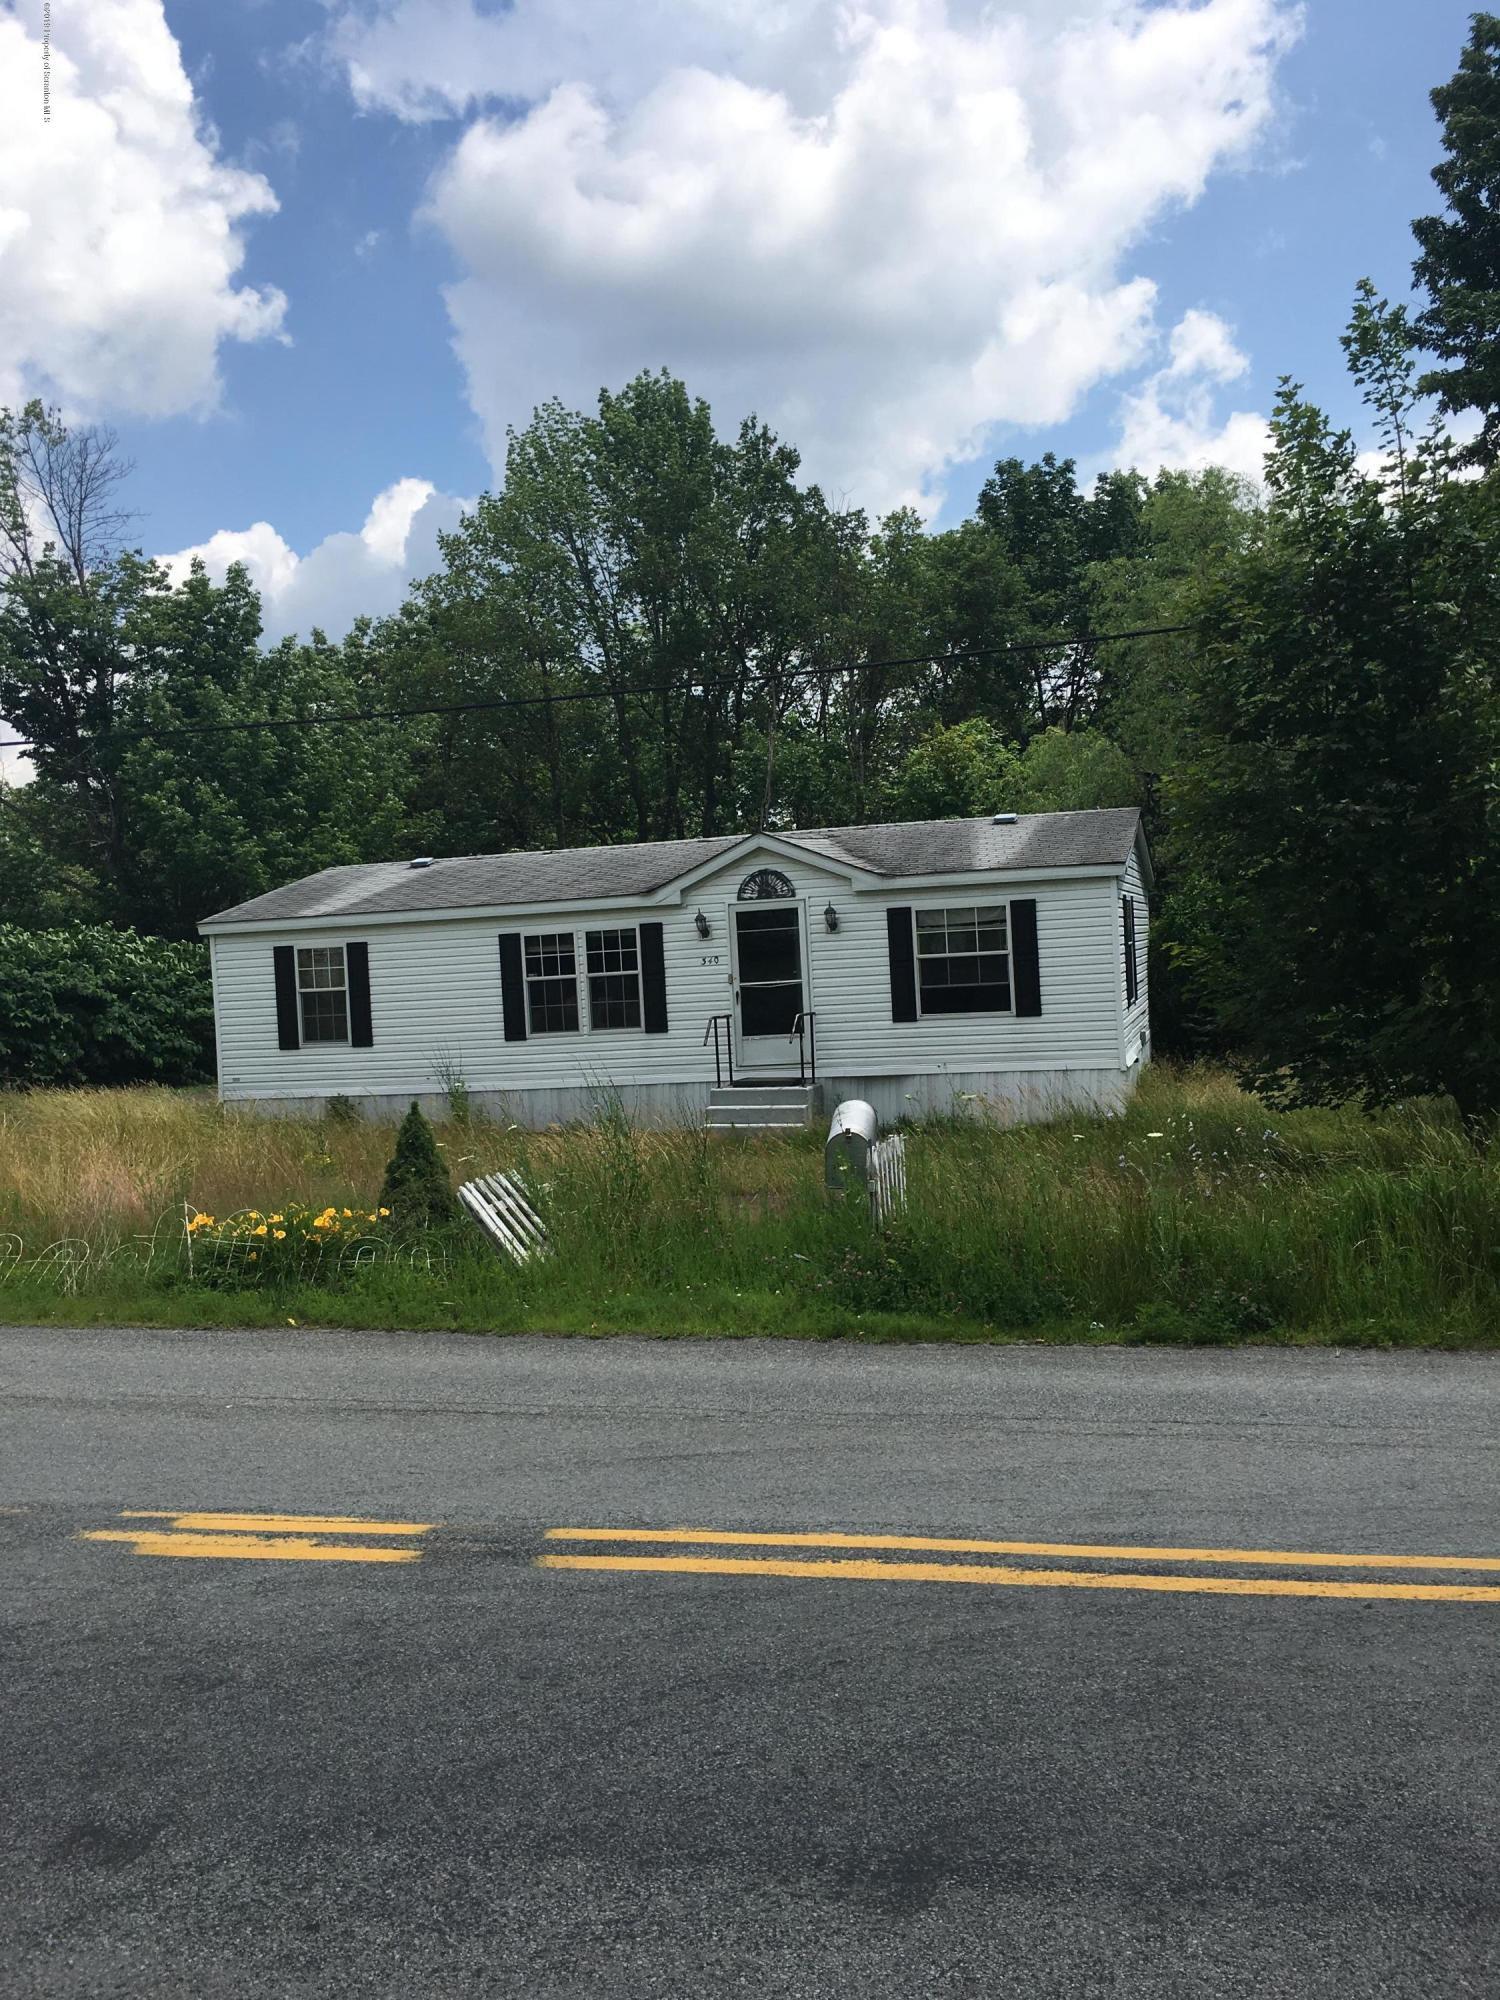 340 Clinton St, Forest City, Pennsylvania 18421, 3 Bedrooms Bedrooms, 5 Rooms Rooms,2 BathroomsBathrooms,Single Family,For Sale,Clinton,19-3198